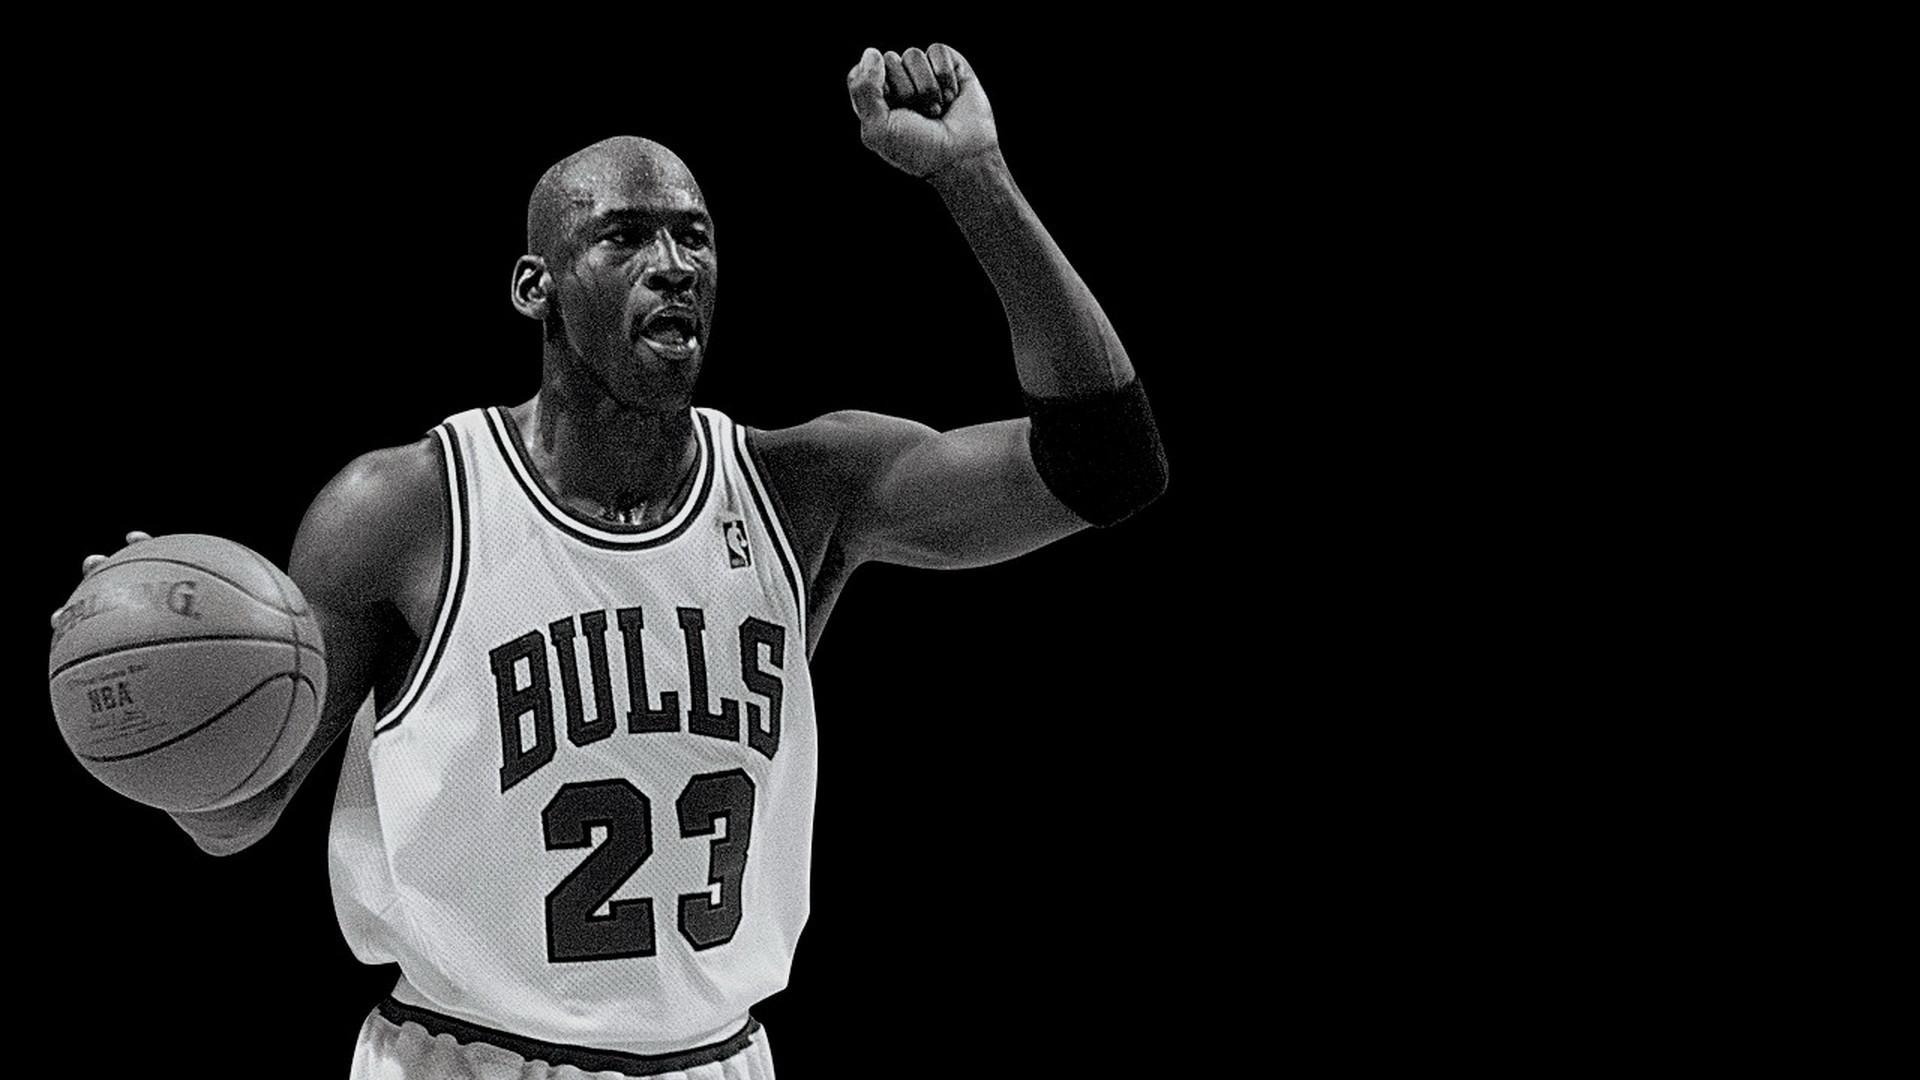 Michael Jordan Basketball 2013 Hd Wallpaper   Data - Michael Jordan Wallpaper Black And White - HD Wallpaper